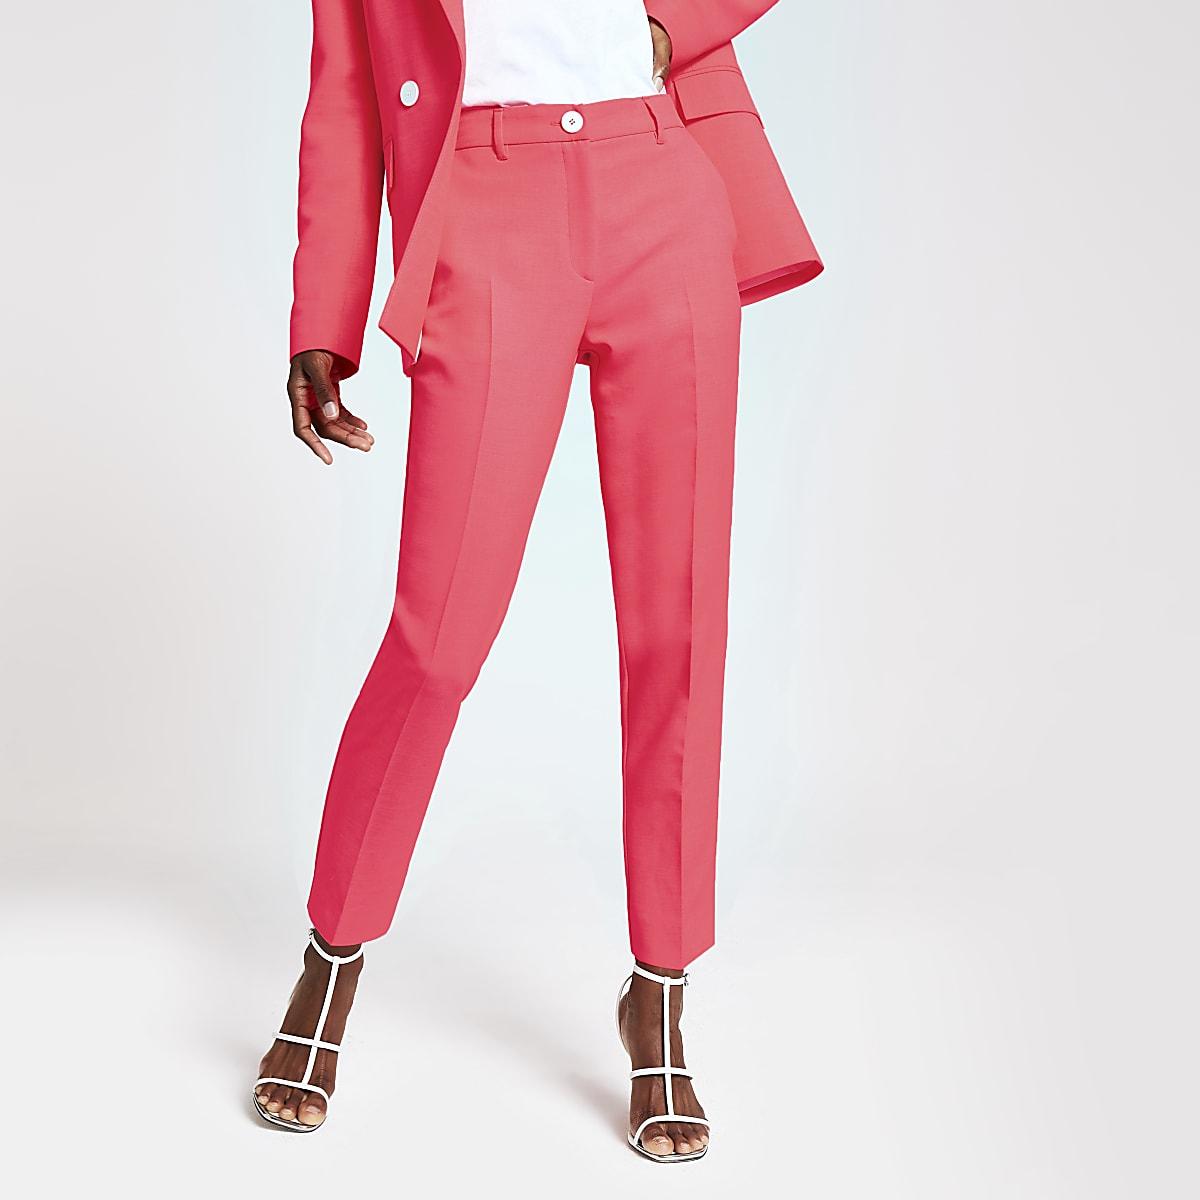 Neon pink cigarette pants